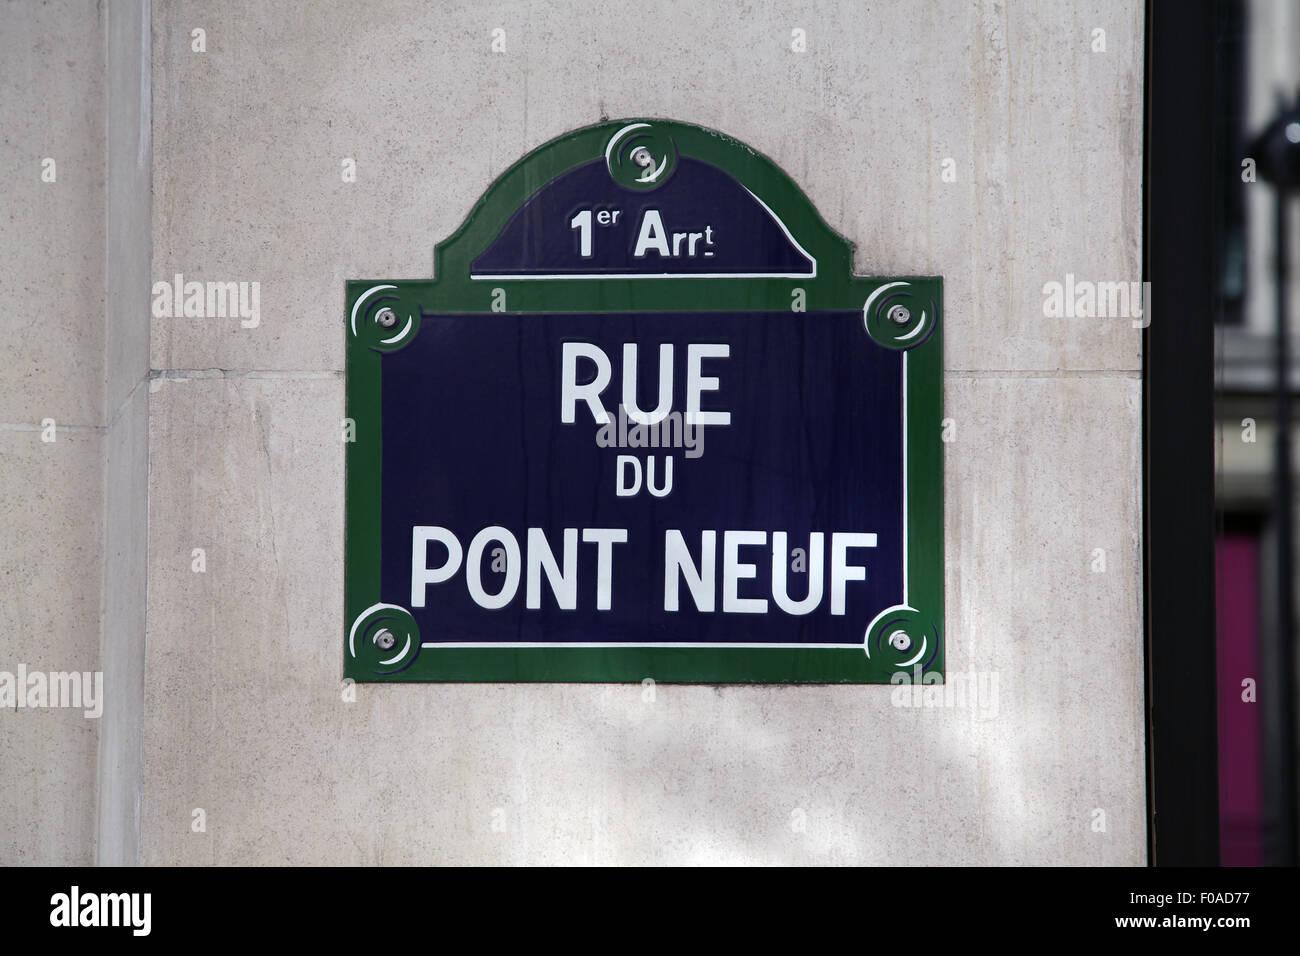 Street sign Rue du Pont Neuf in Paris France - Stock Image